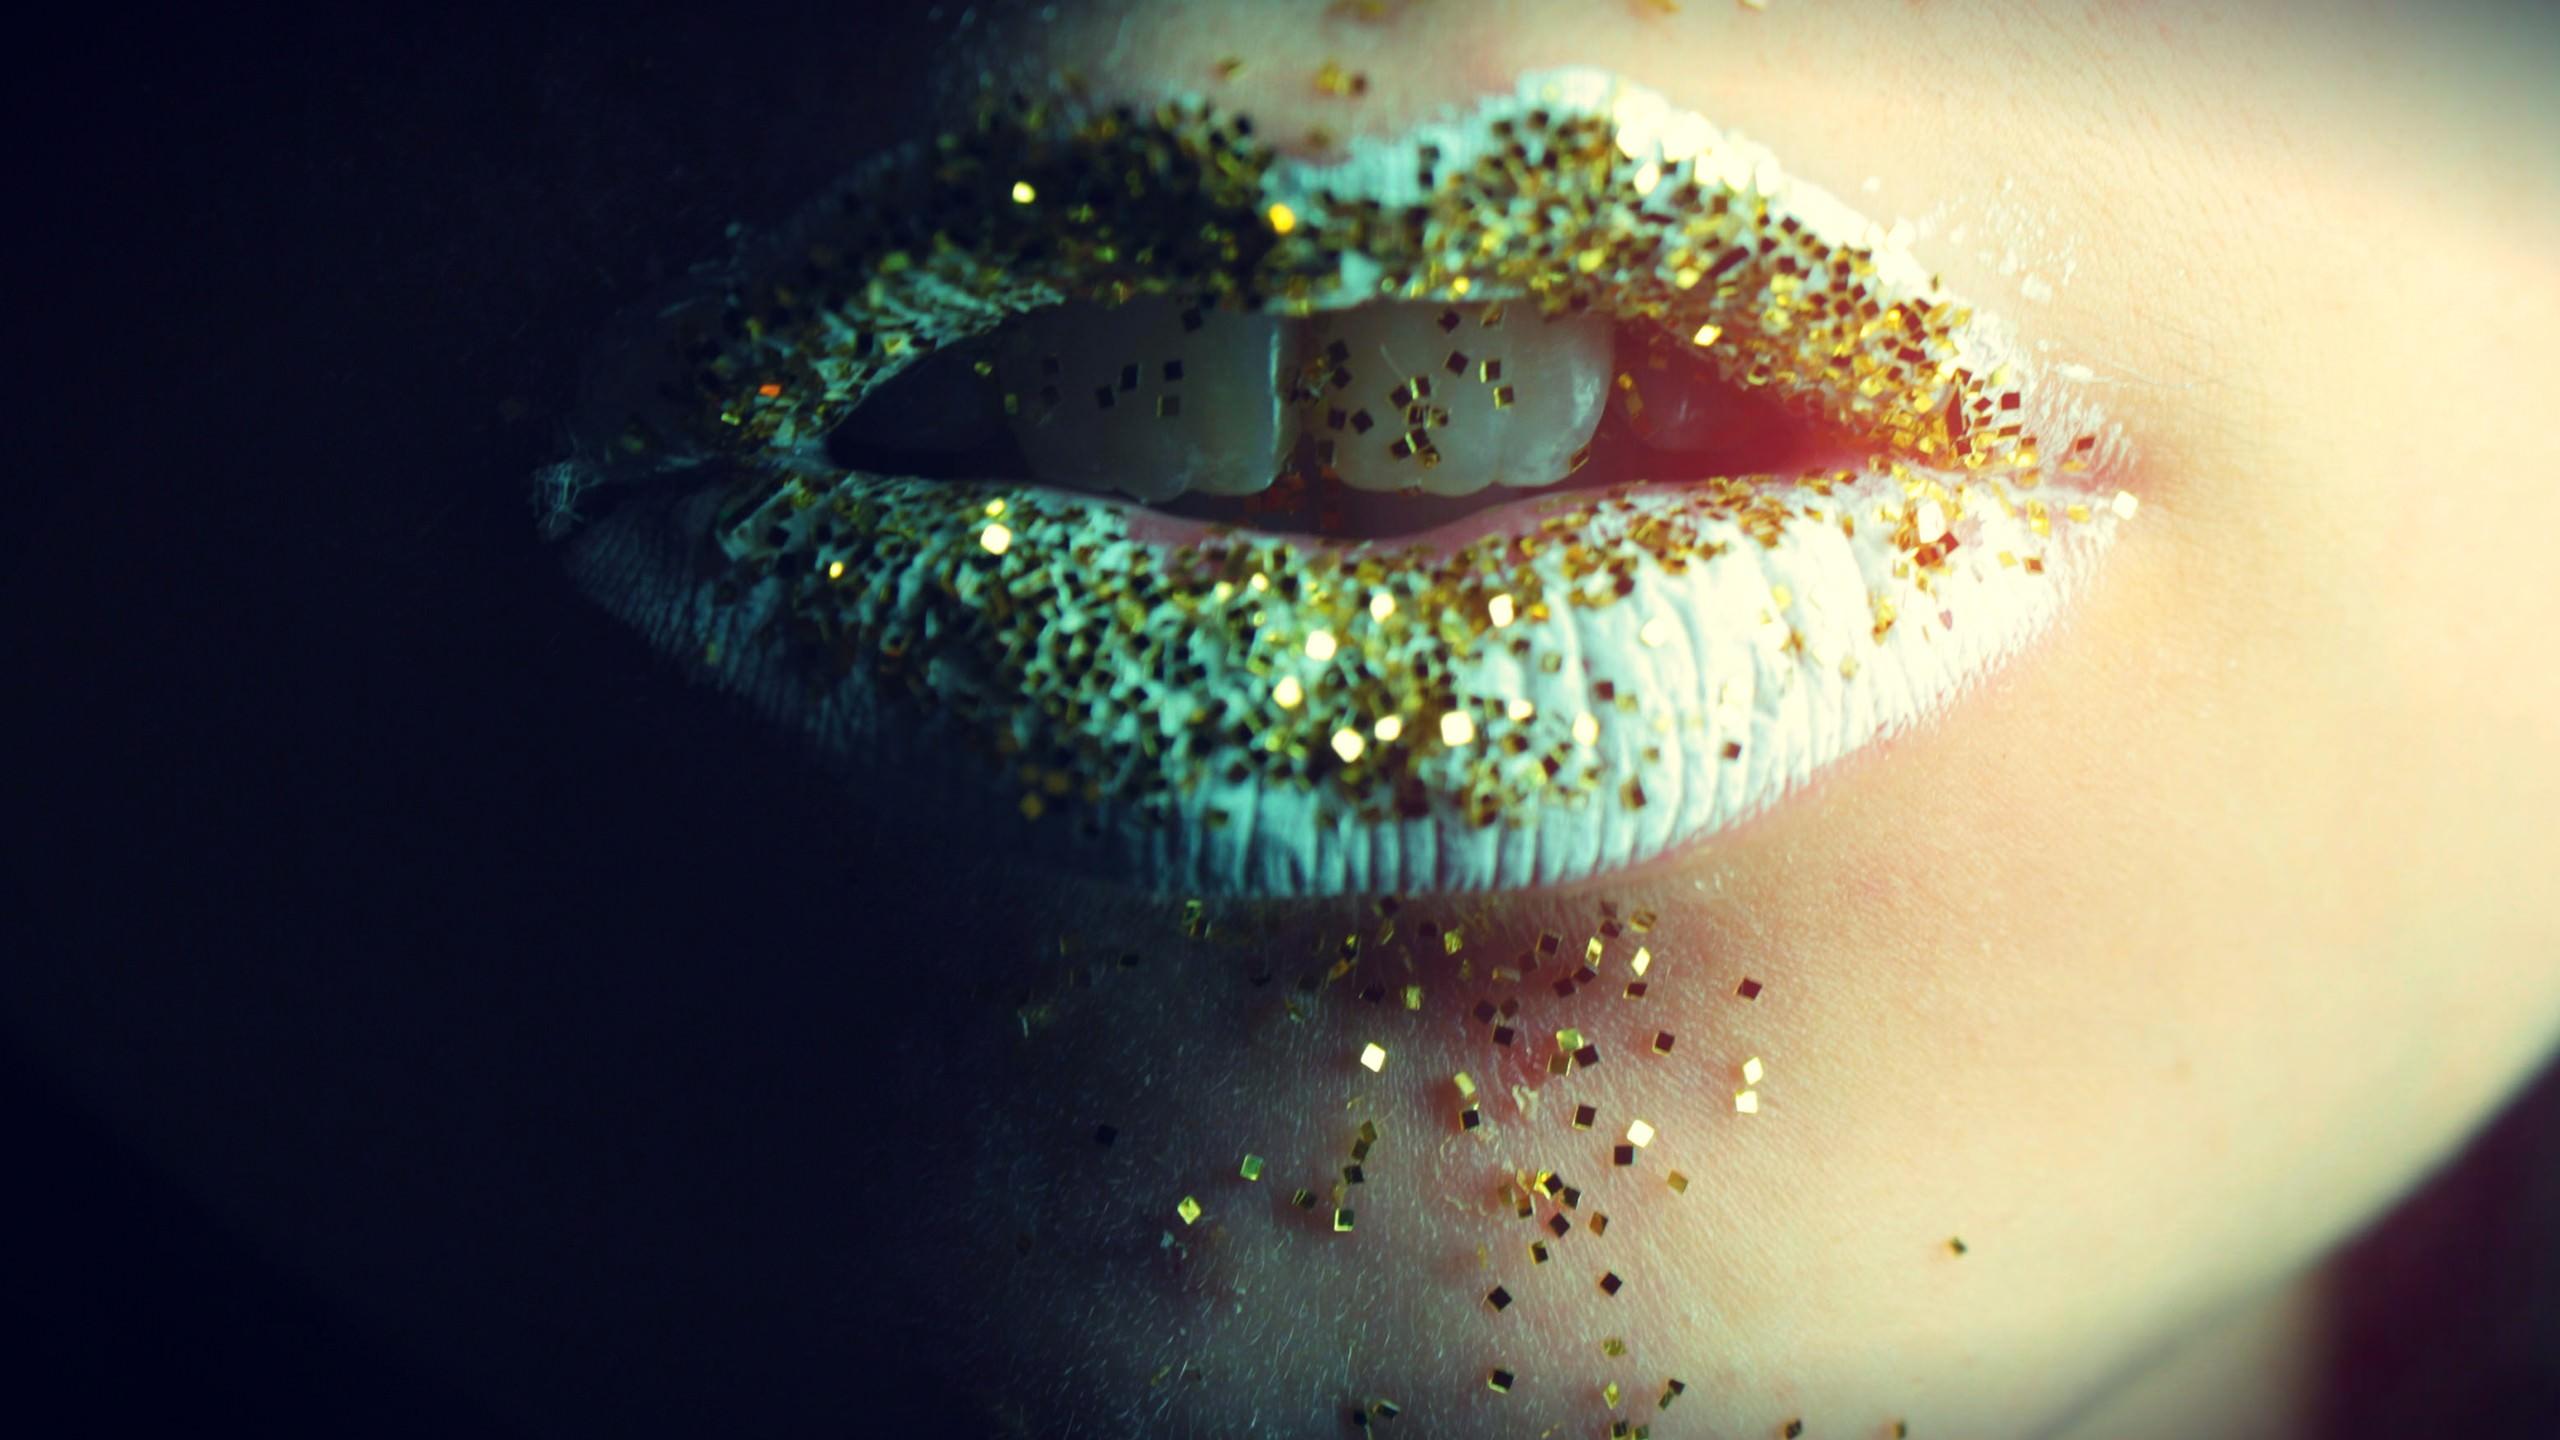 lips wallpaper hd desktop - photo #24